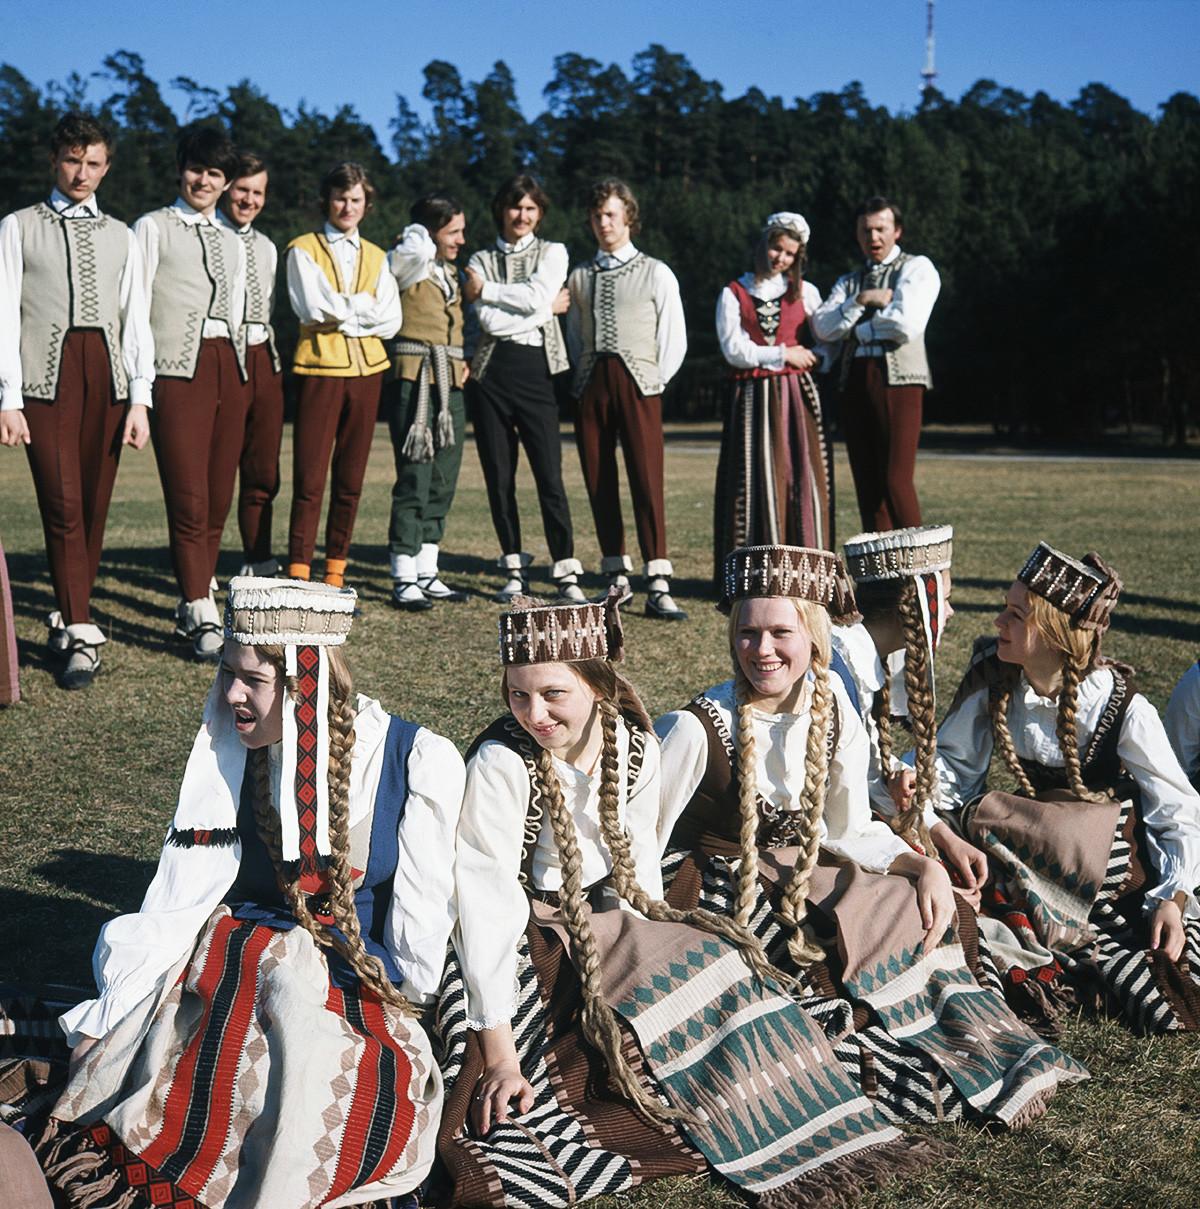 Conjunto musical de la Universidad Estatal de Vilna, Lituania, 1974